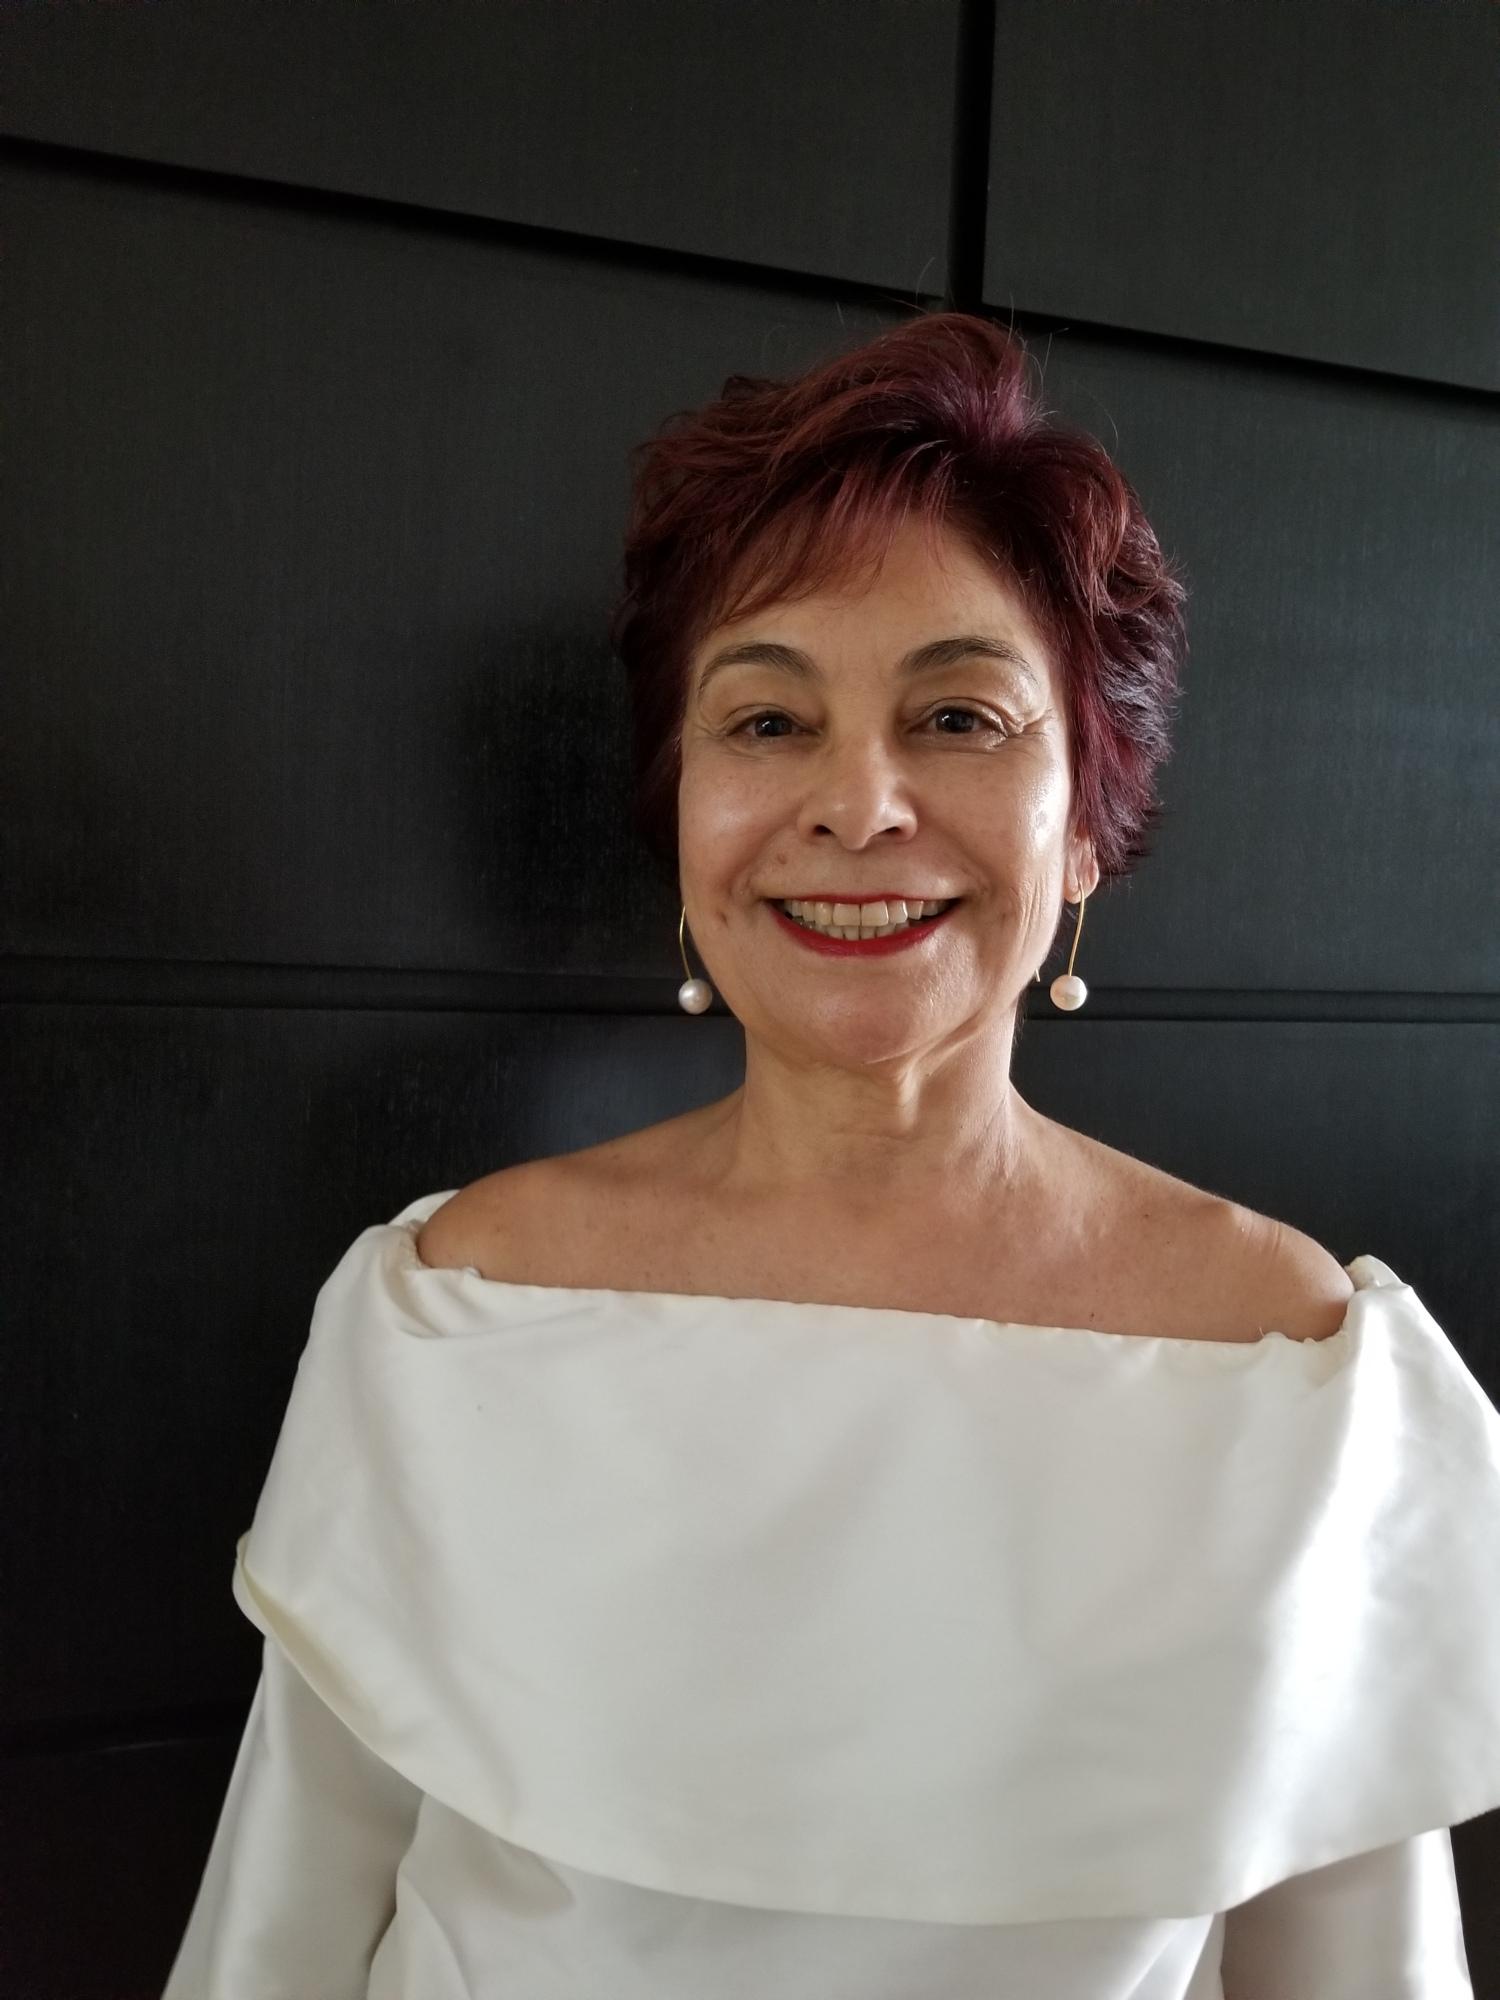 Heloisa Junqueira Fleury